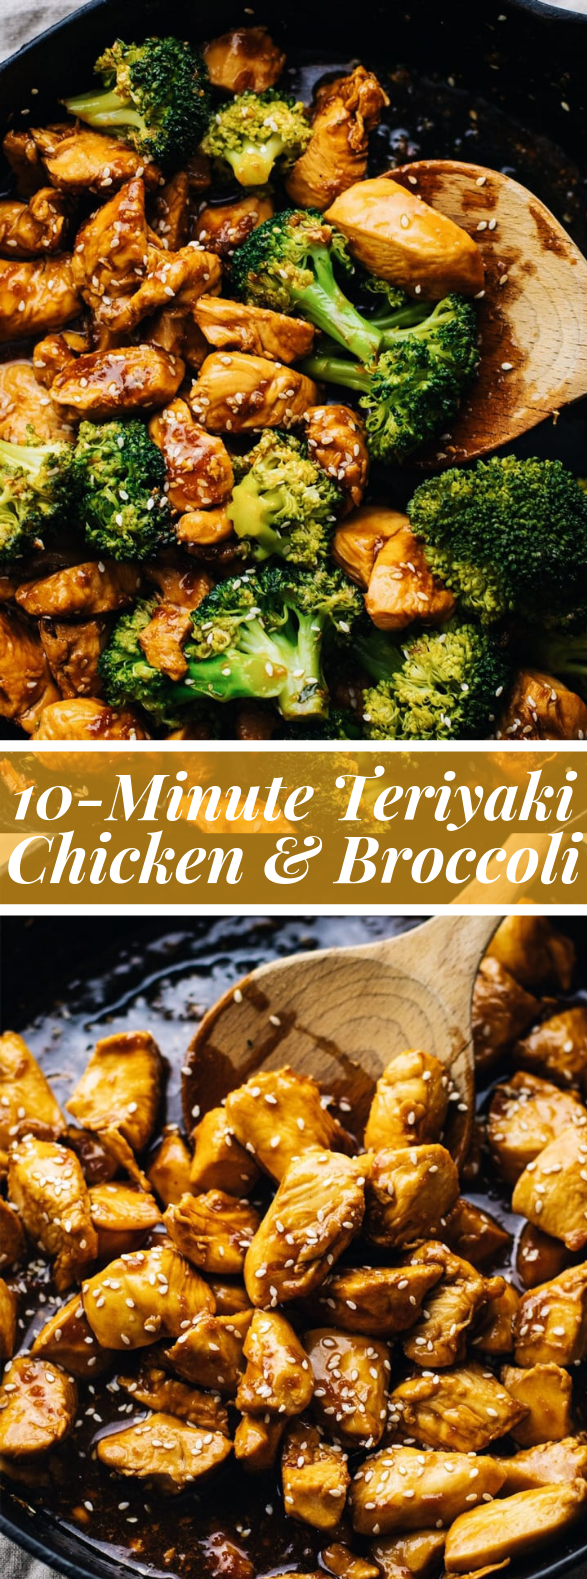 10-Minute Teriyaki Chicken & Broccoli #healthydinner #lowcarb